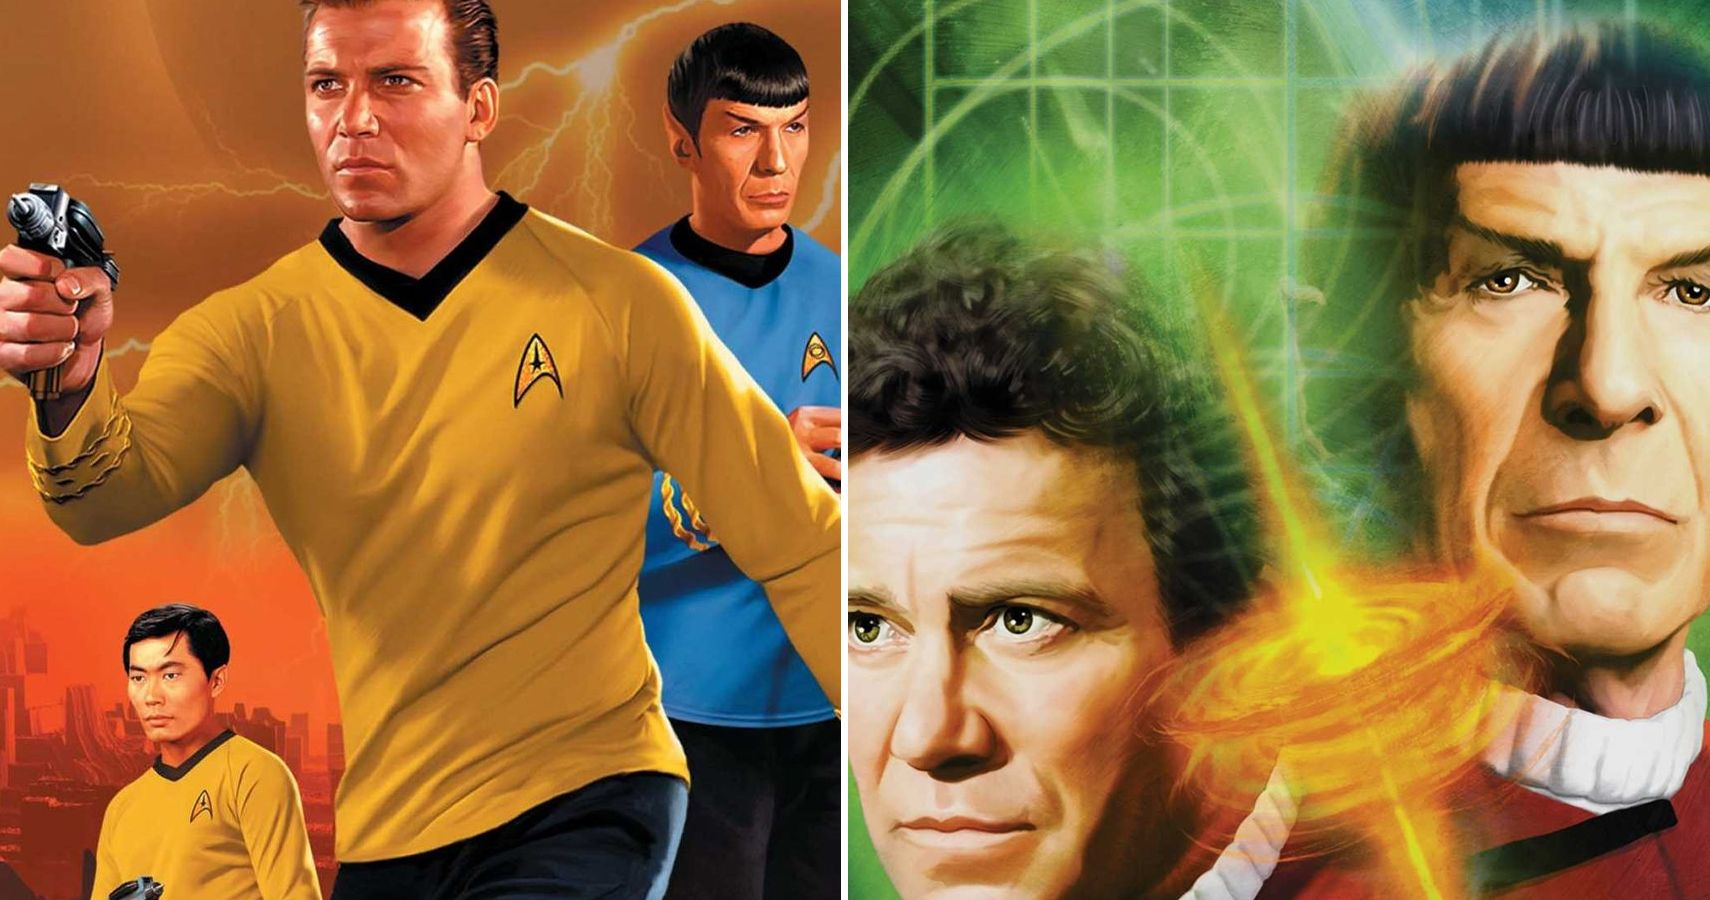 Star Trek: The 8 Most Memorable Episodes The Original Series